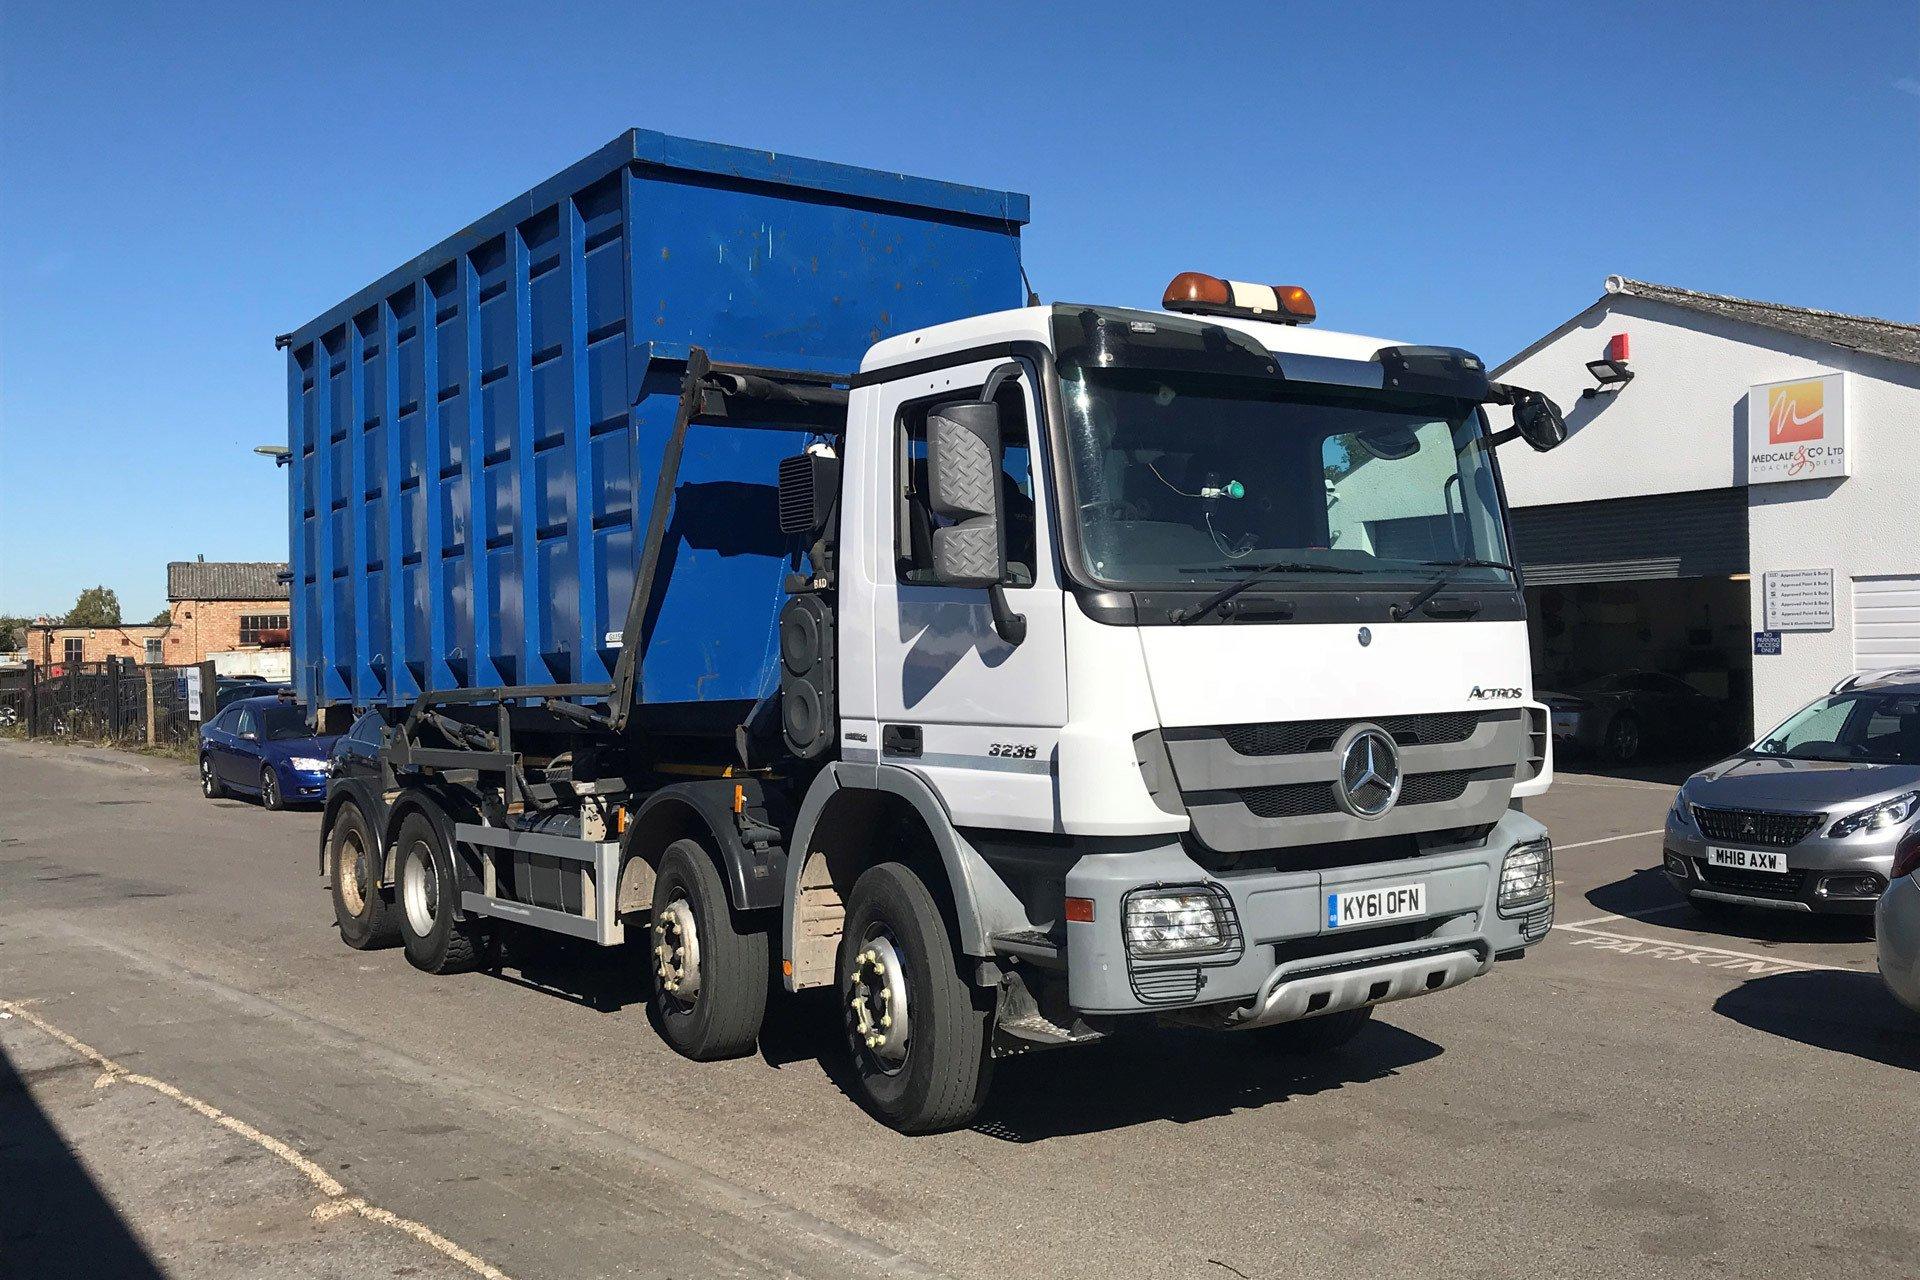 Simvic-Scrap-Metal-Collection-Vehicle